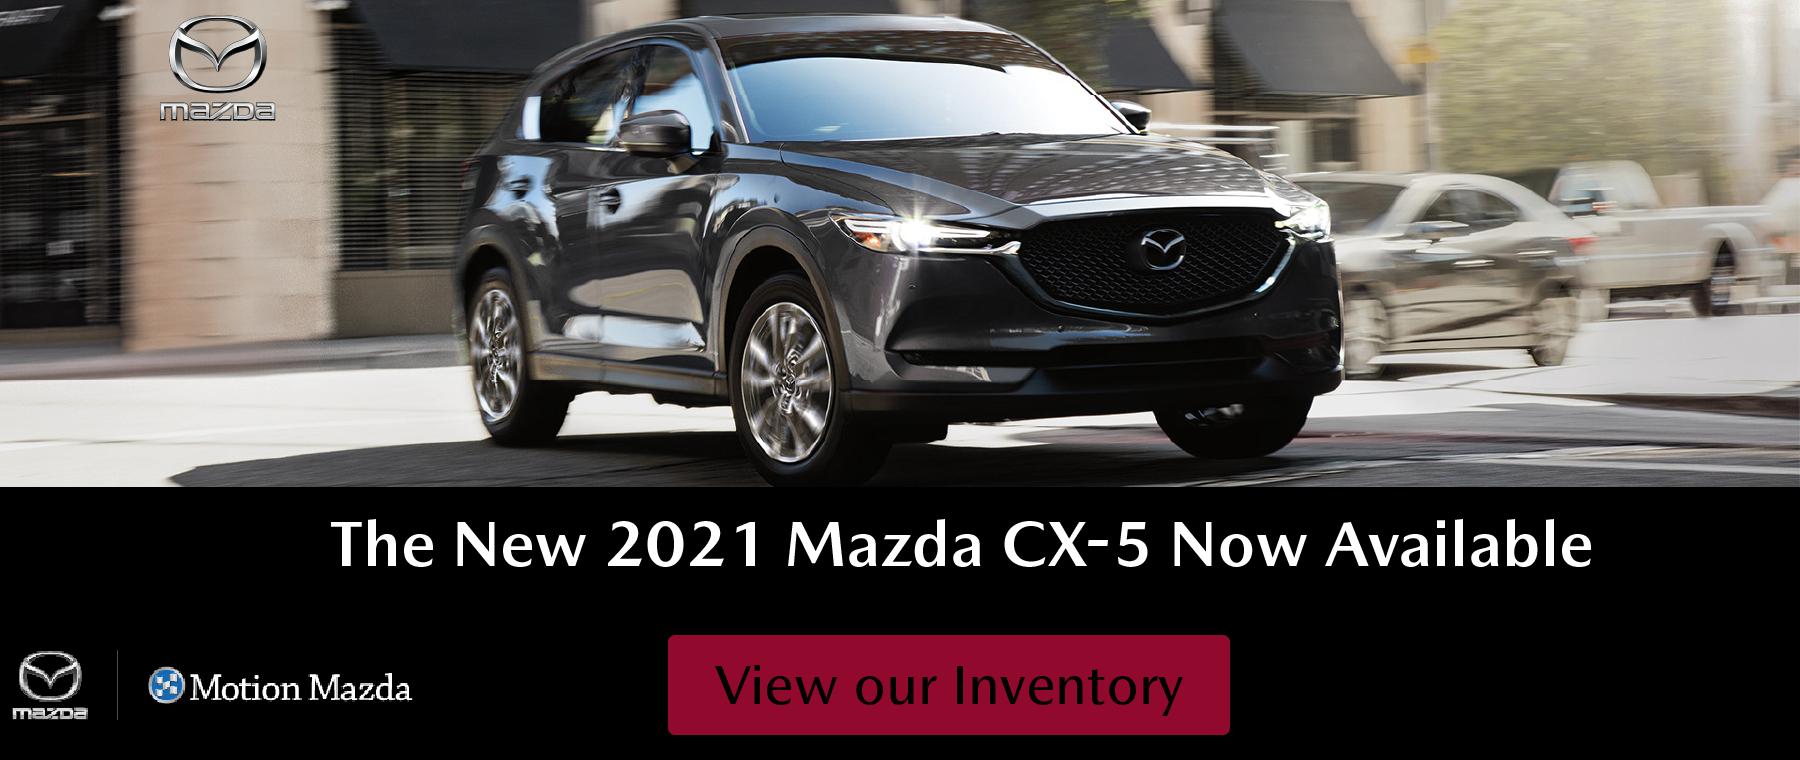 Motion Mazda CX-5